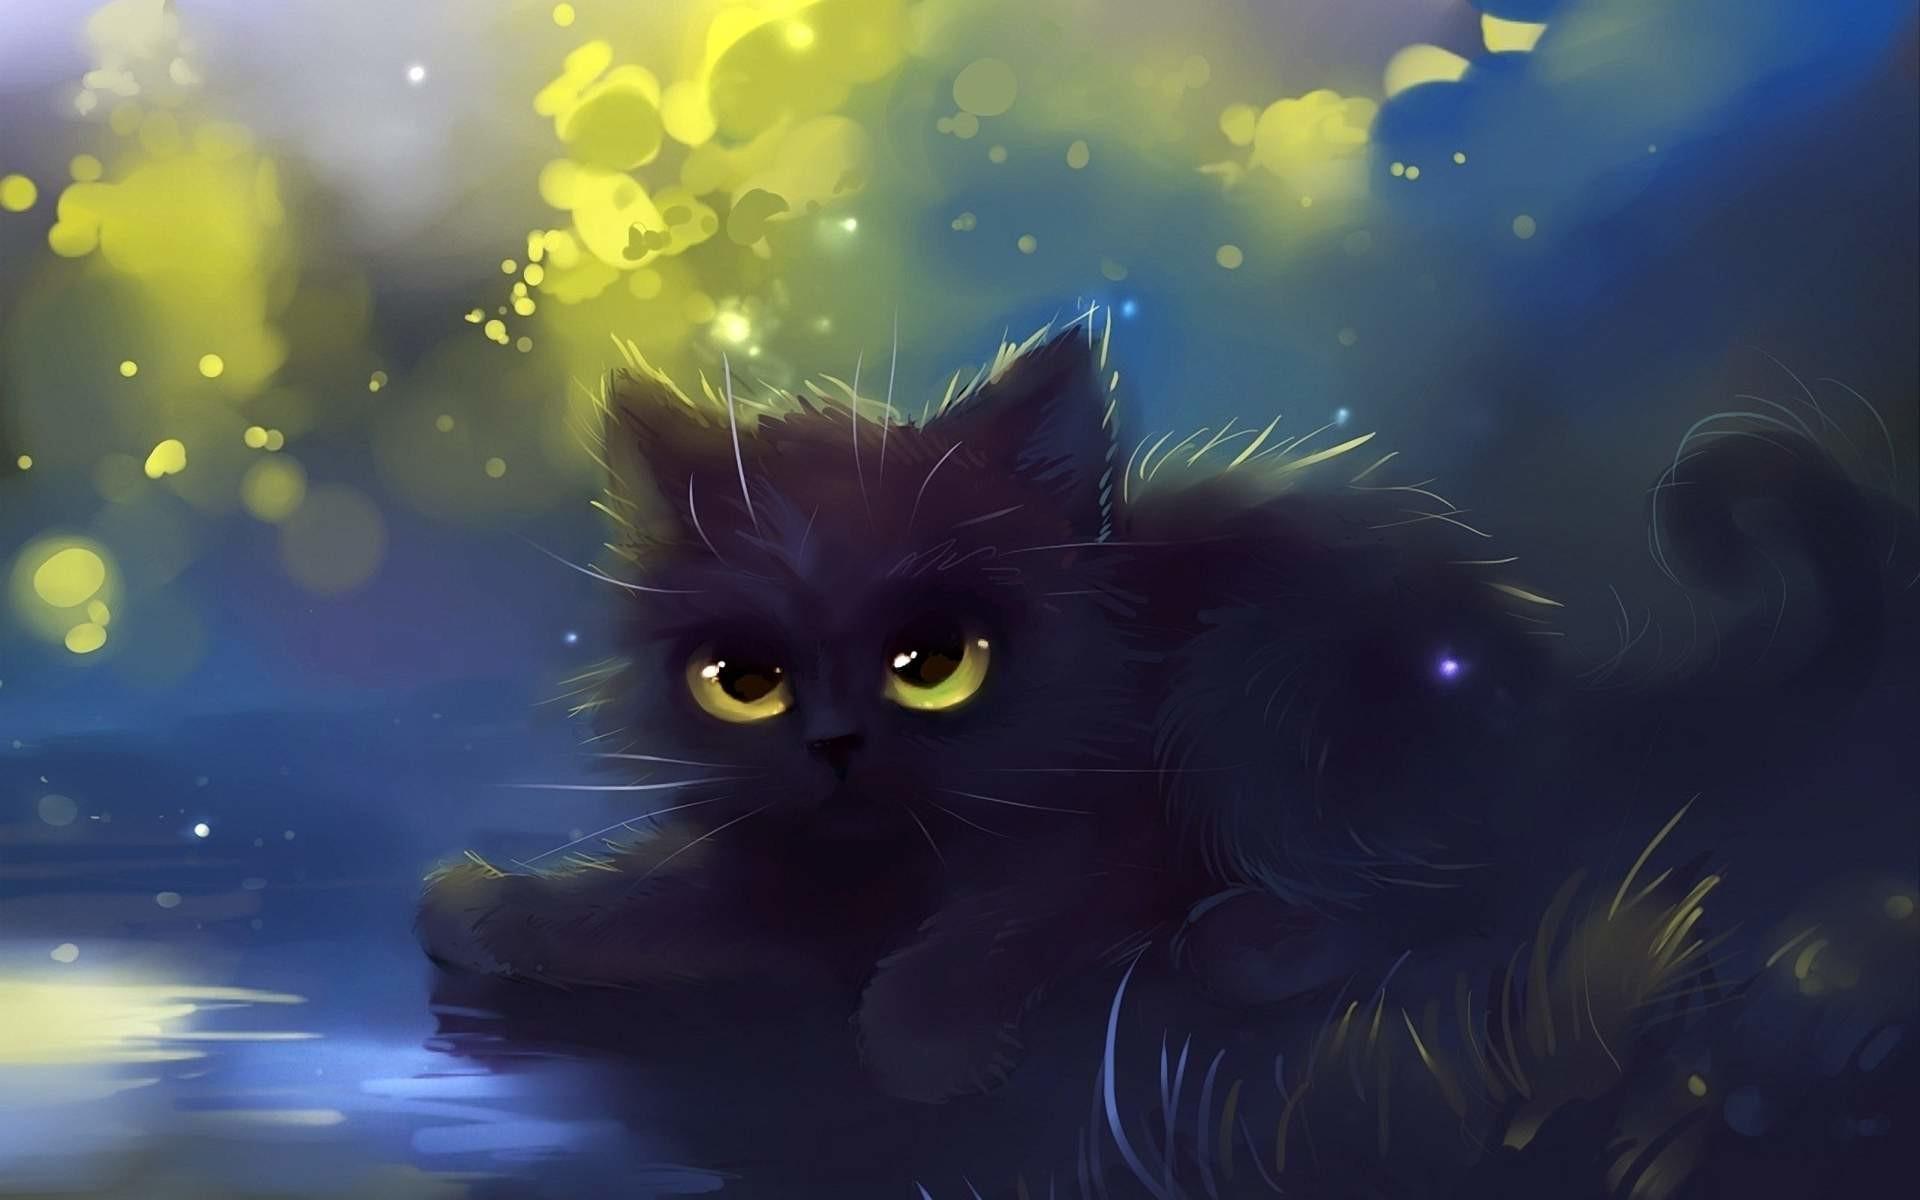 Black Cat Eyes Wallpaper (69+ images)